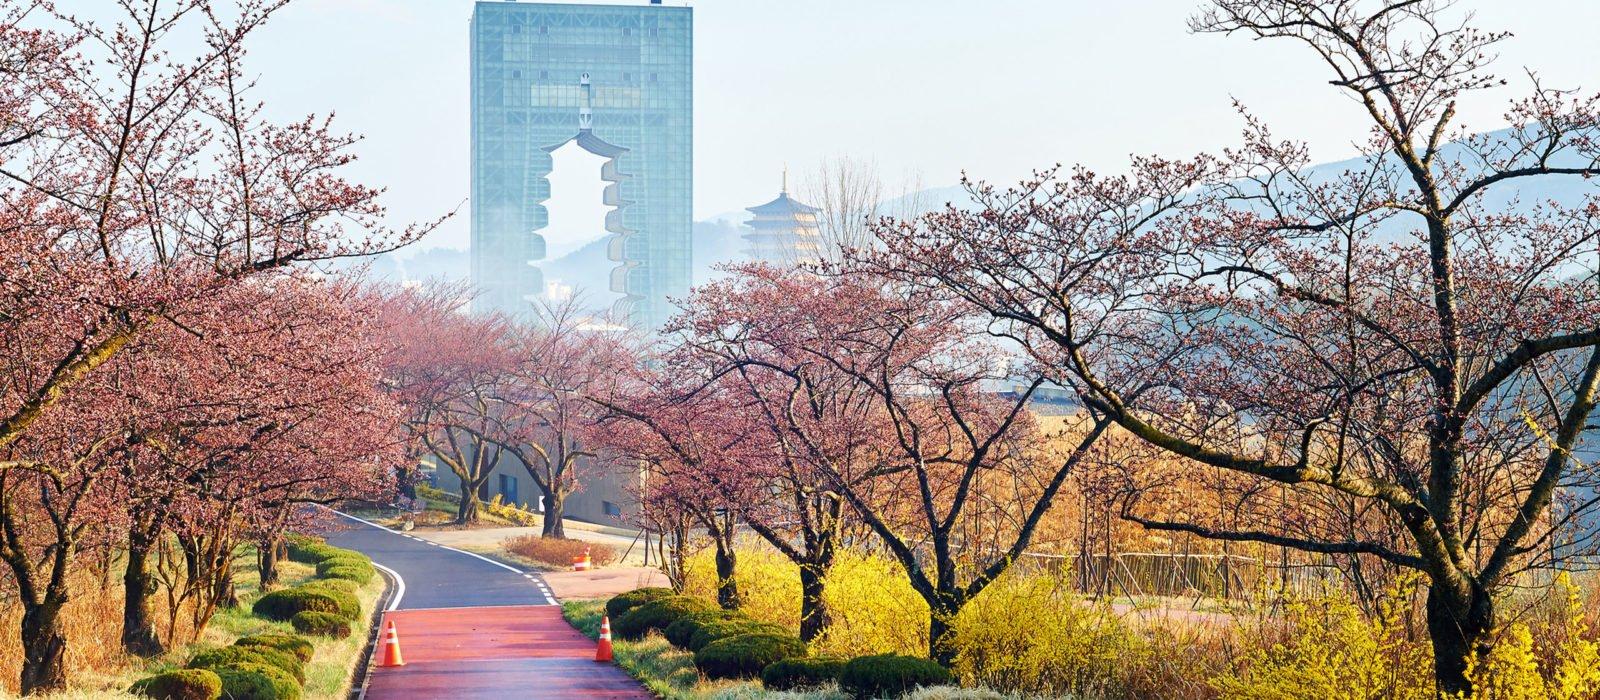 gyeonju-tower-south-korea